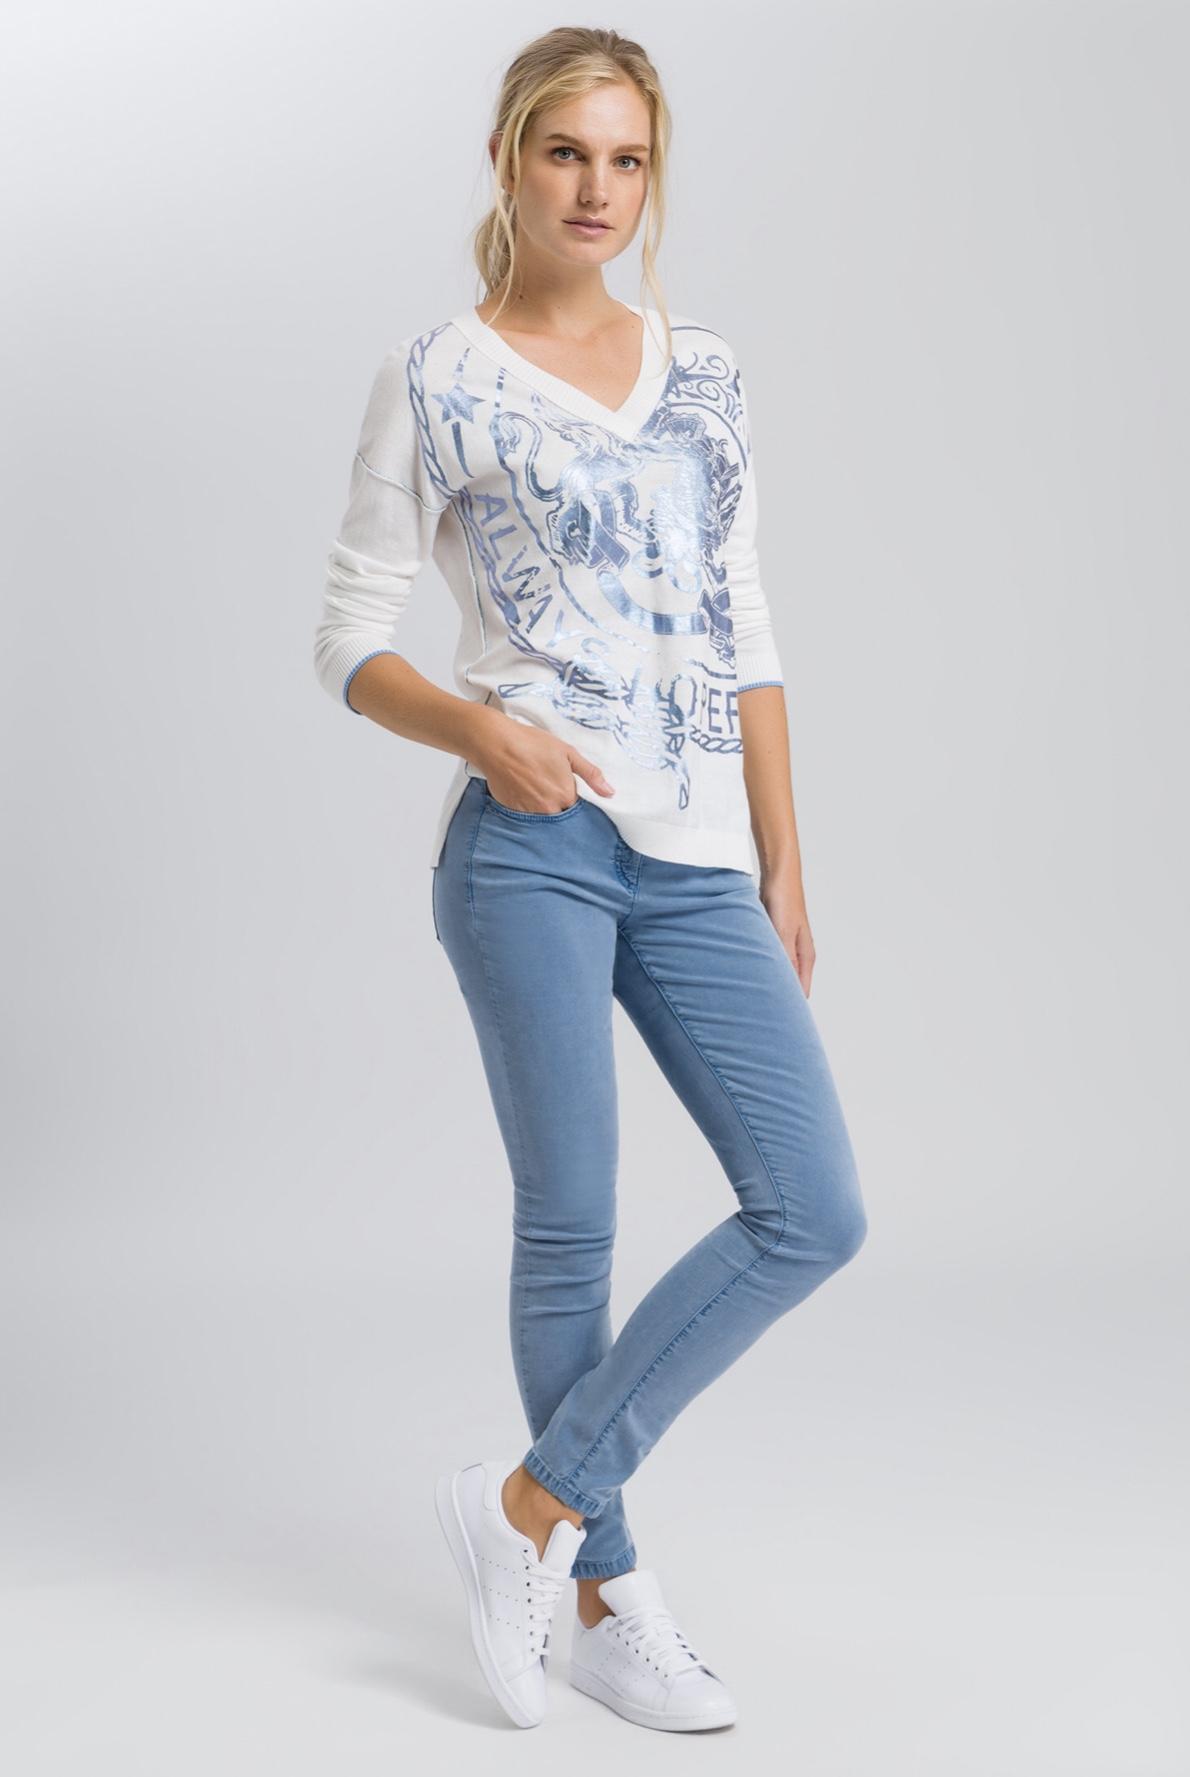 762cfe92419c Yasmine of Bawtry | Women's Fashion Store | Marc Aurel Collection